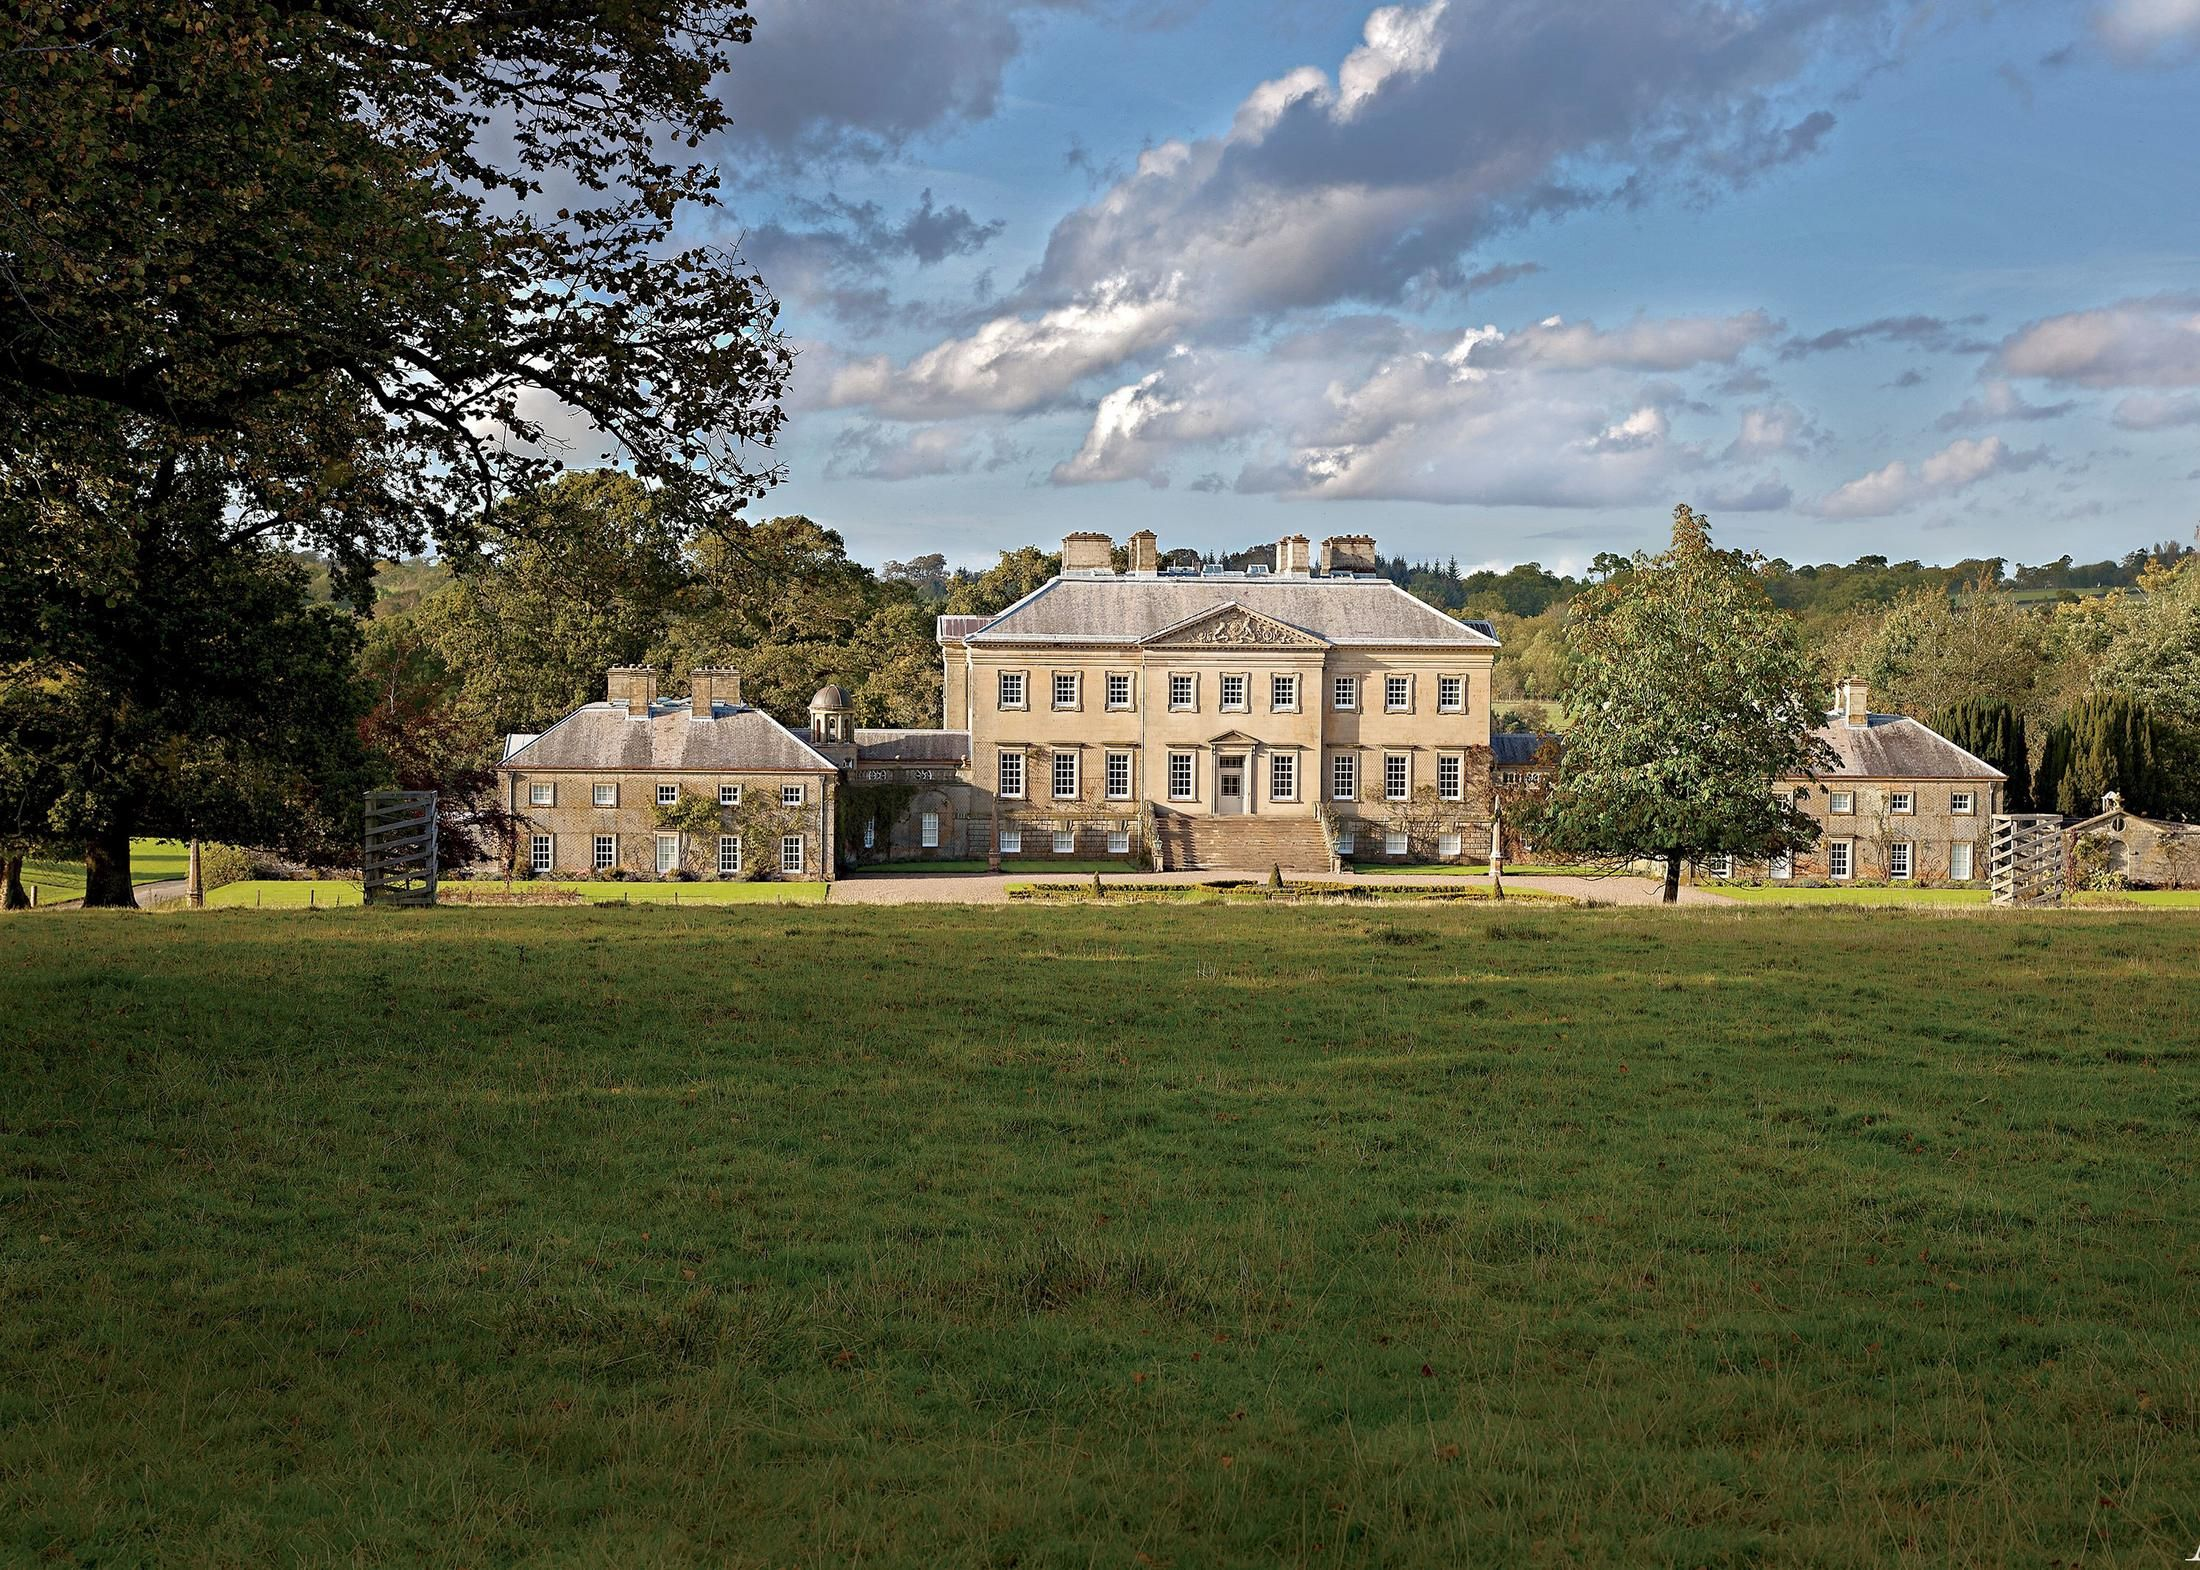 Prince charlesu renovated historic scottish home country houses